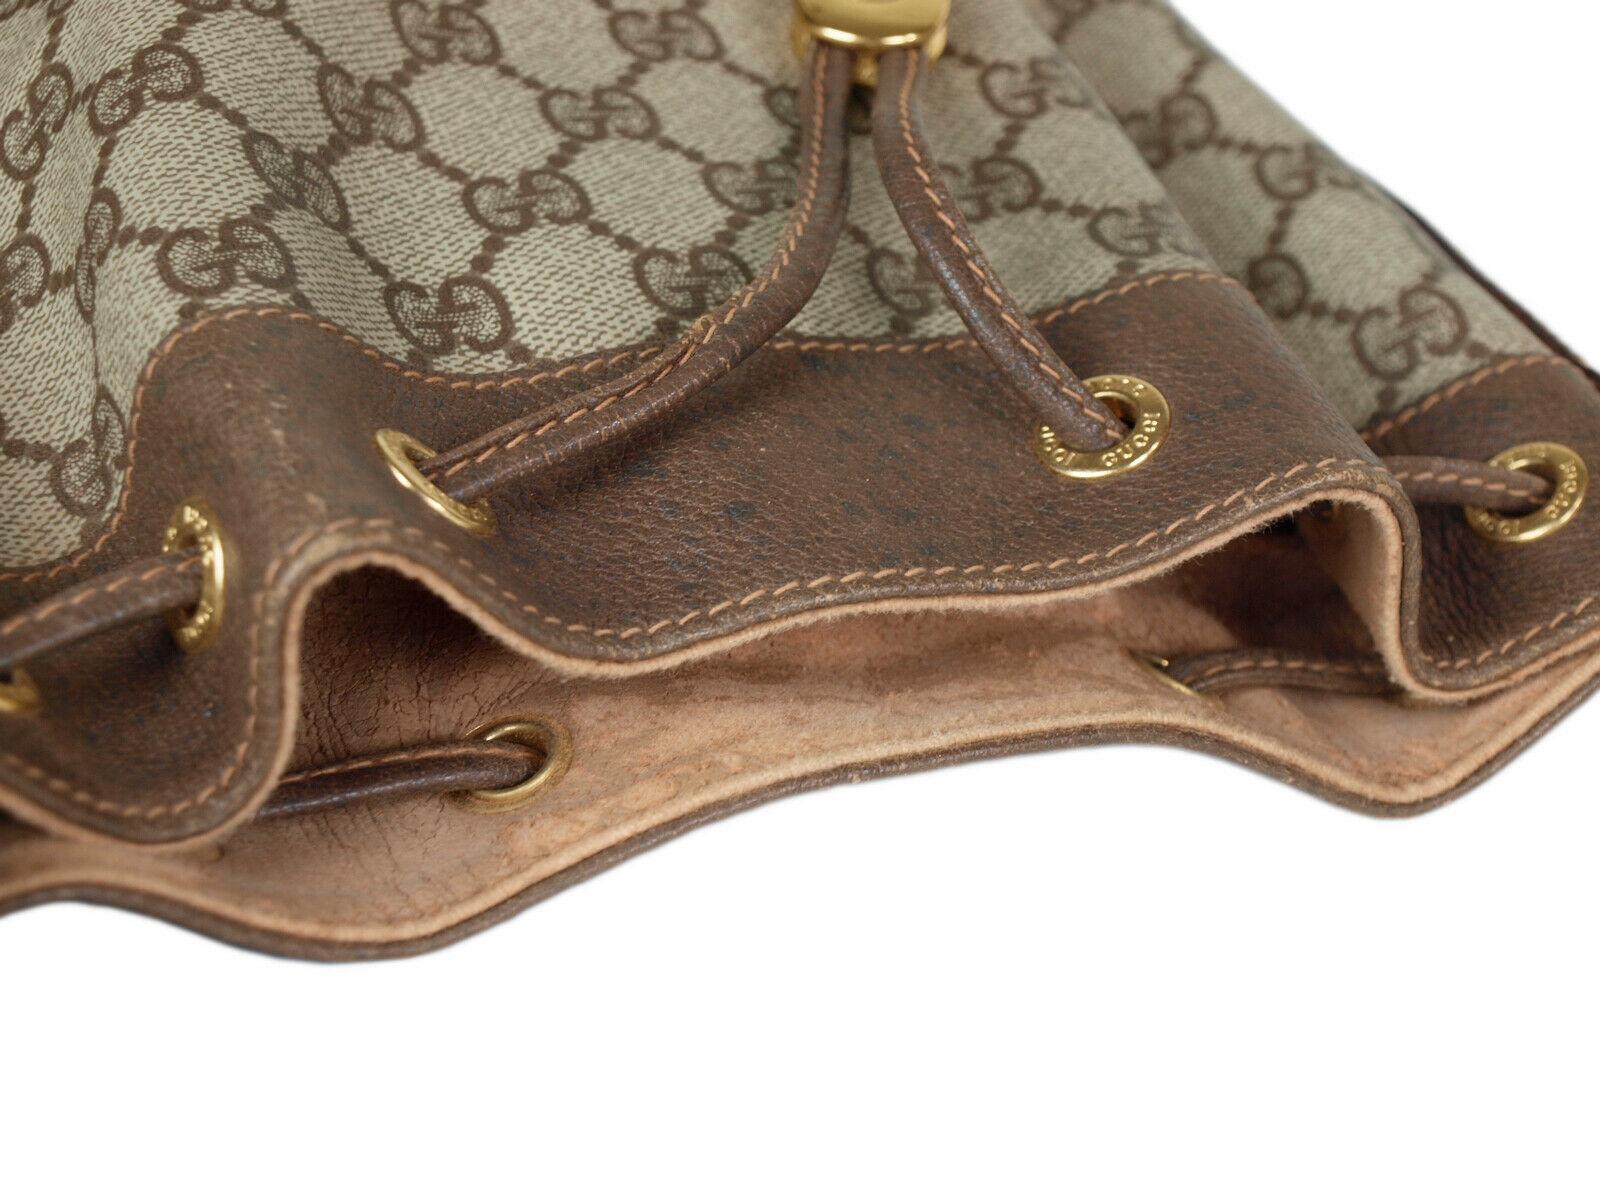 GUCCI GG Web PVC Canvas Leather Browns Drawstring Shoulder Bag GS2171 image 7